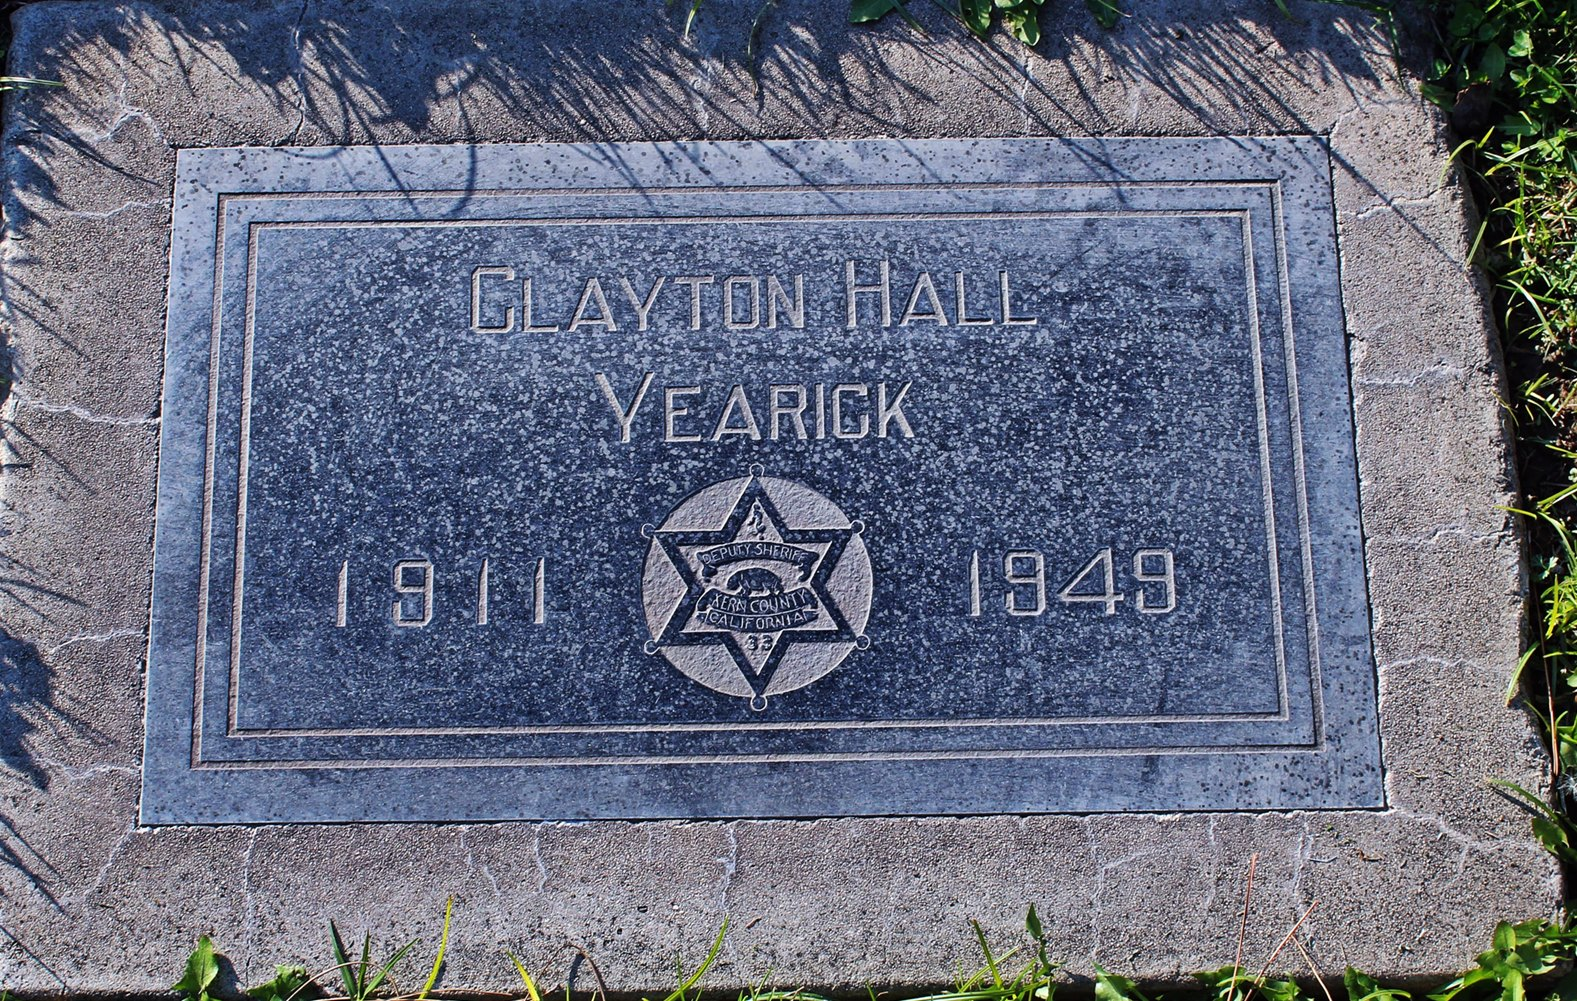 Sergeant Clayton Hall Yearick | Kern County Sheriff's Office, California